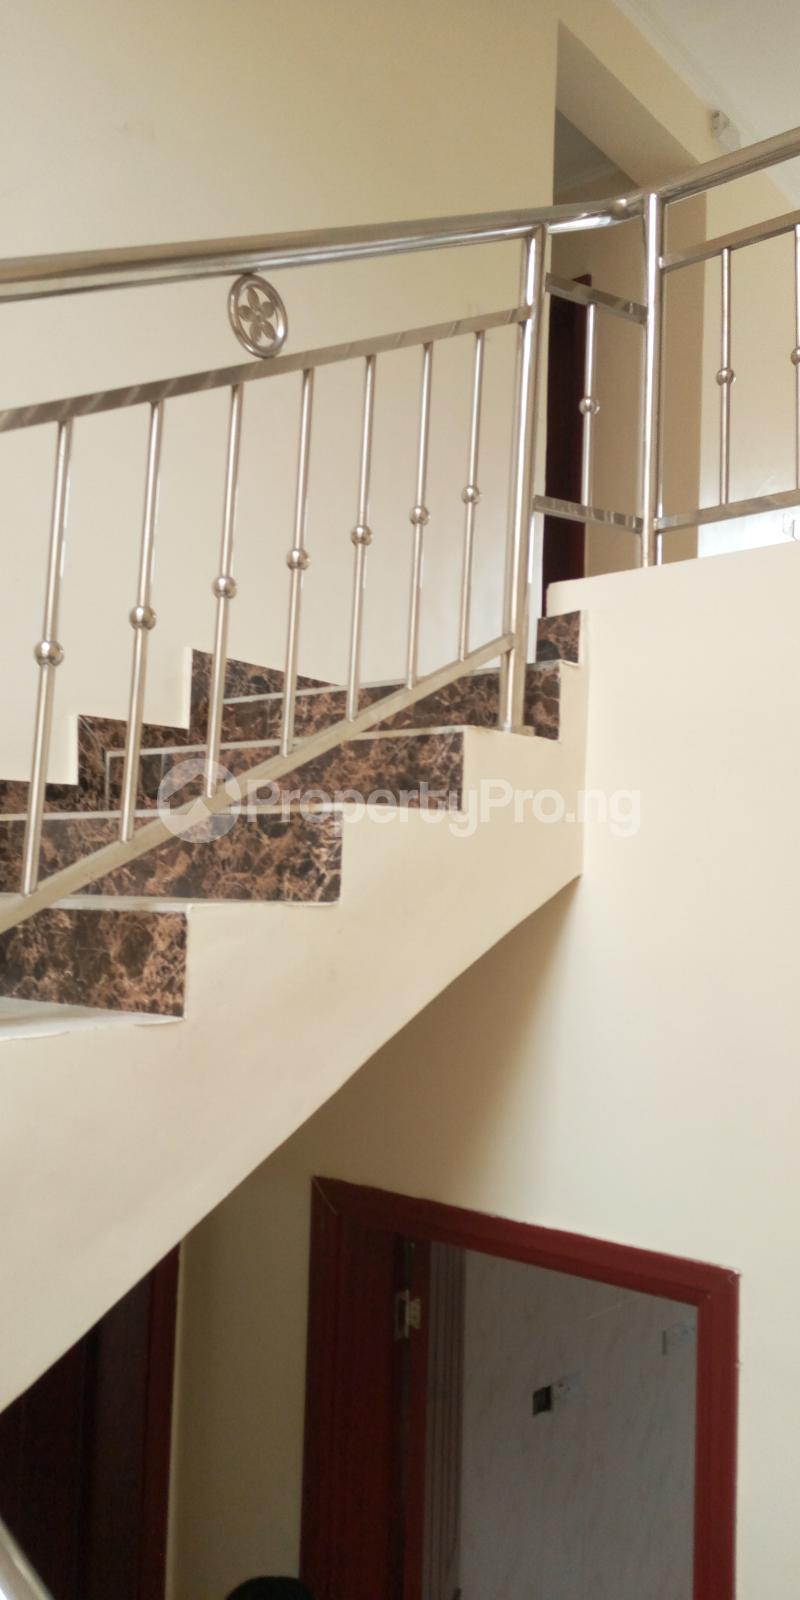 5 bedroom Detached Duplex House for rent Peace Gardens Estate Monastery road Sangotedo Lagos - 4